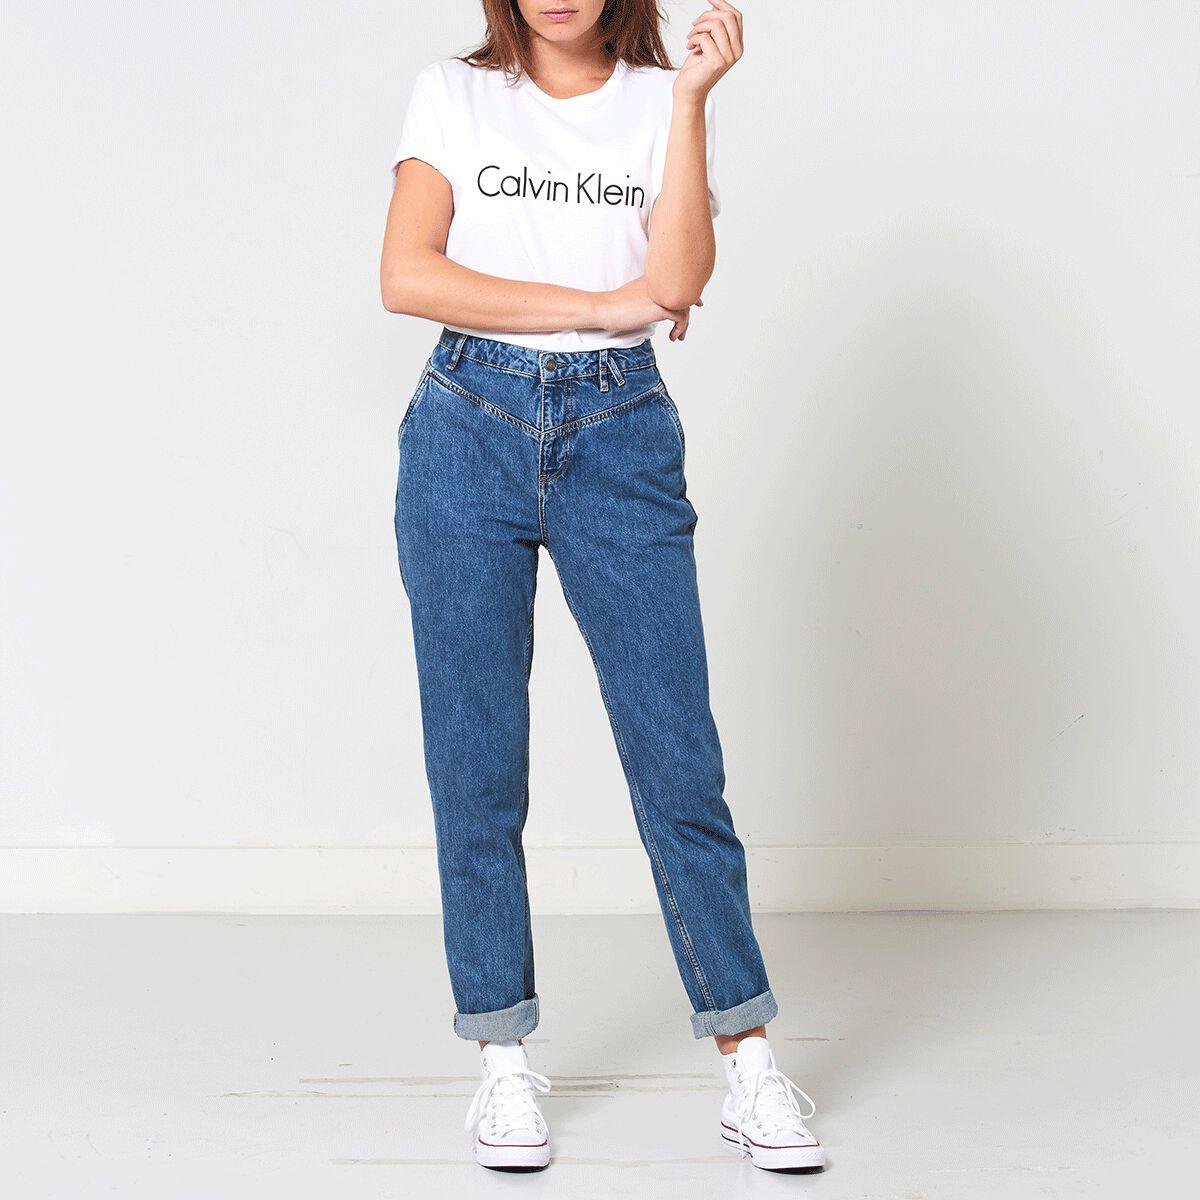 d6430539271 Women T-shirt Calvin Klein S S Crew Neck White Buy Online